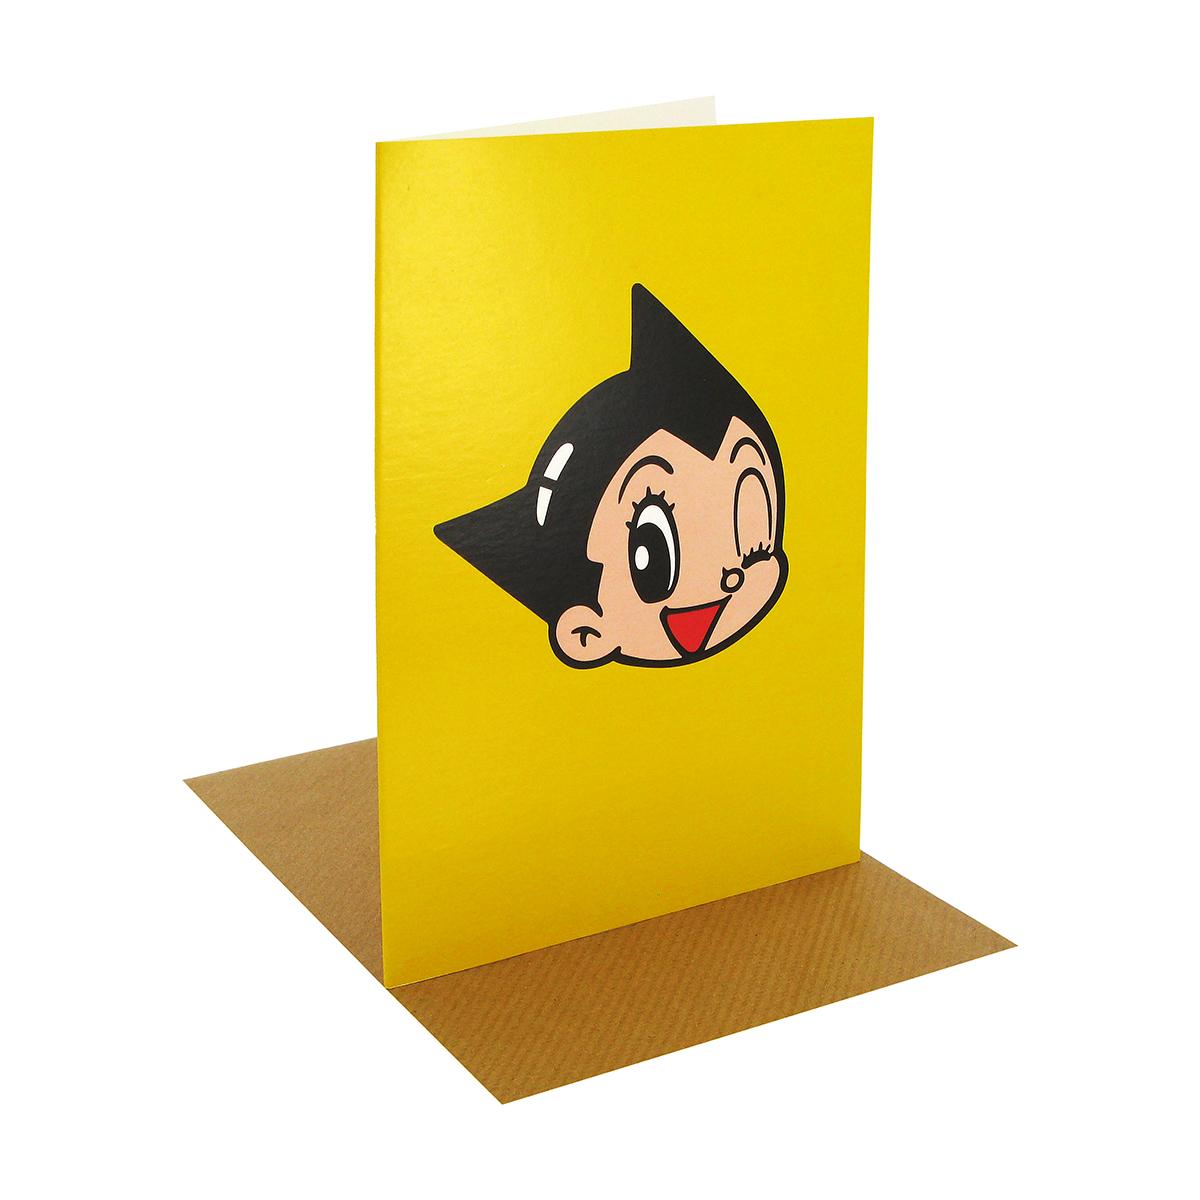 Astro boy greeting card (yellow)